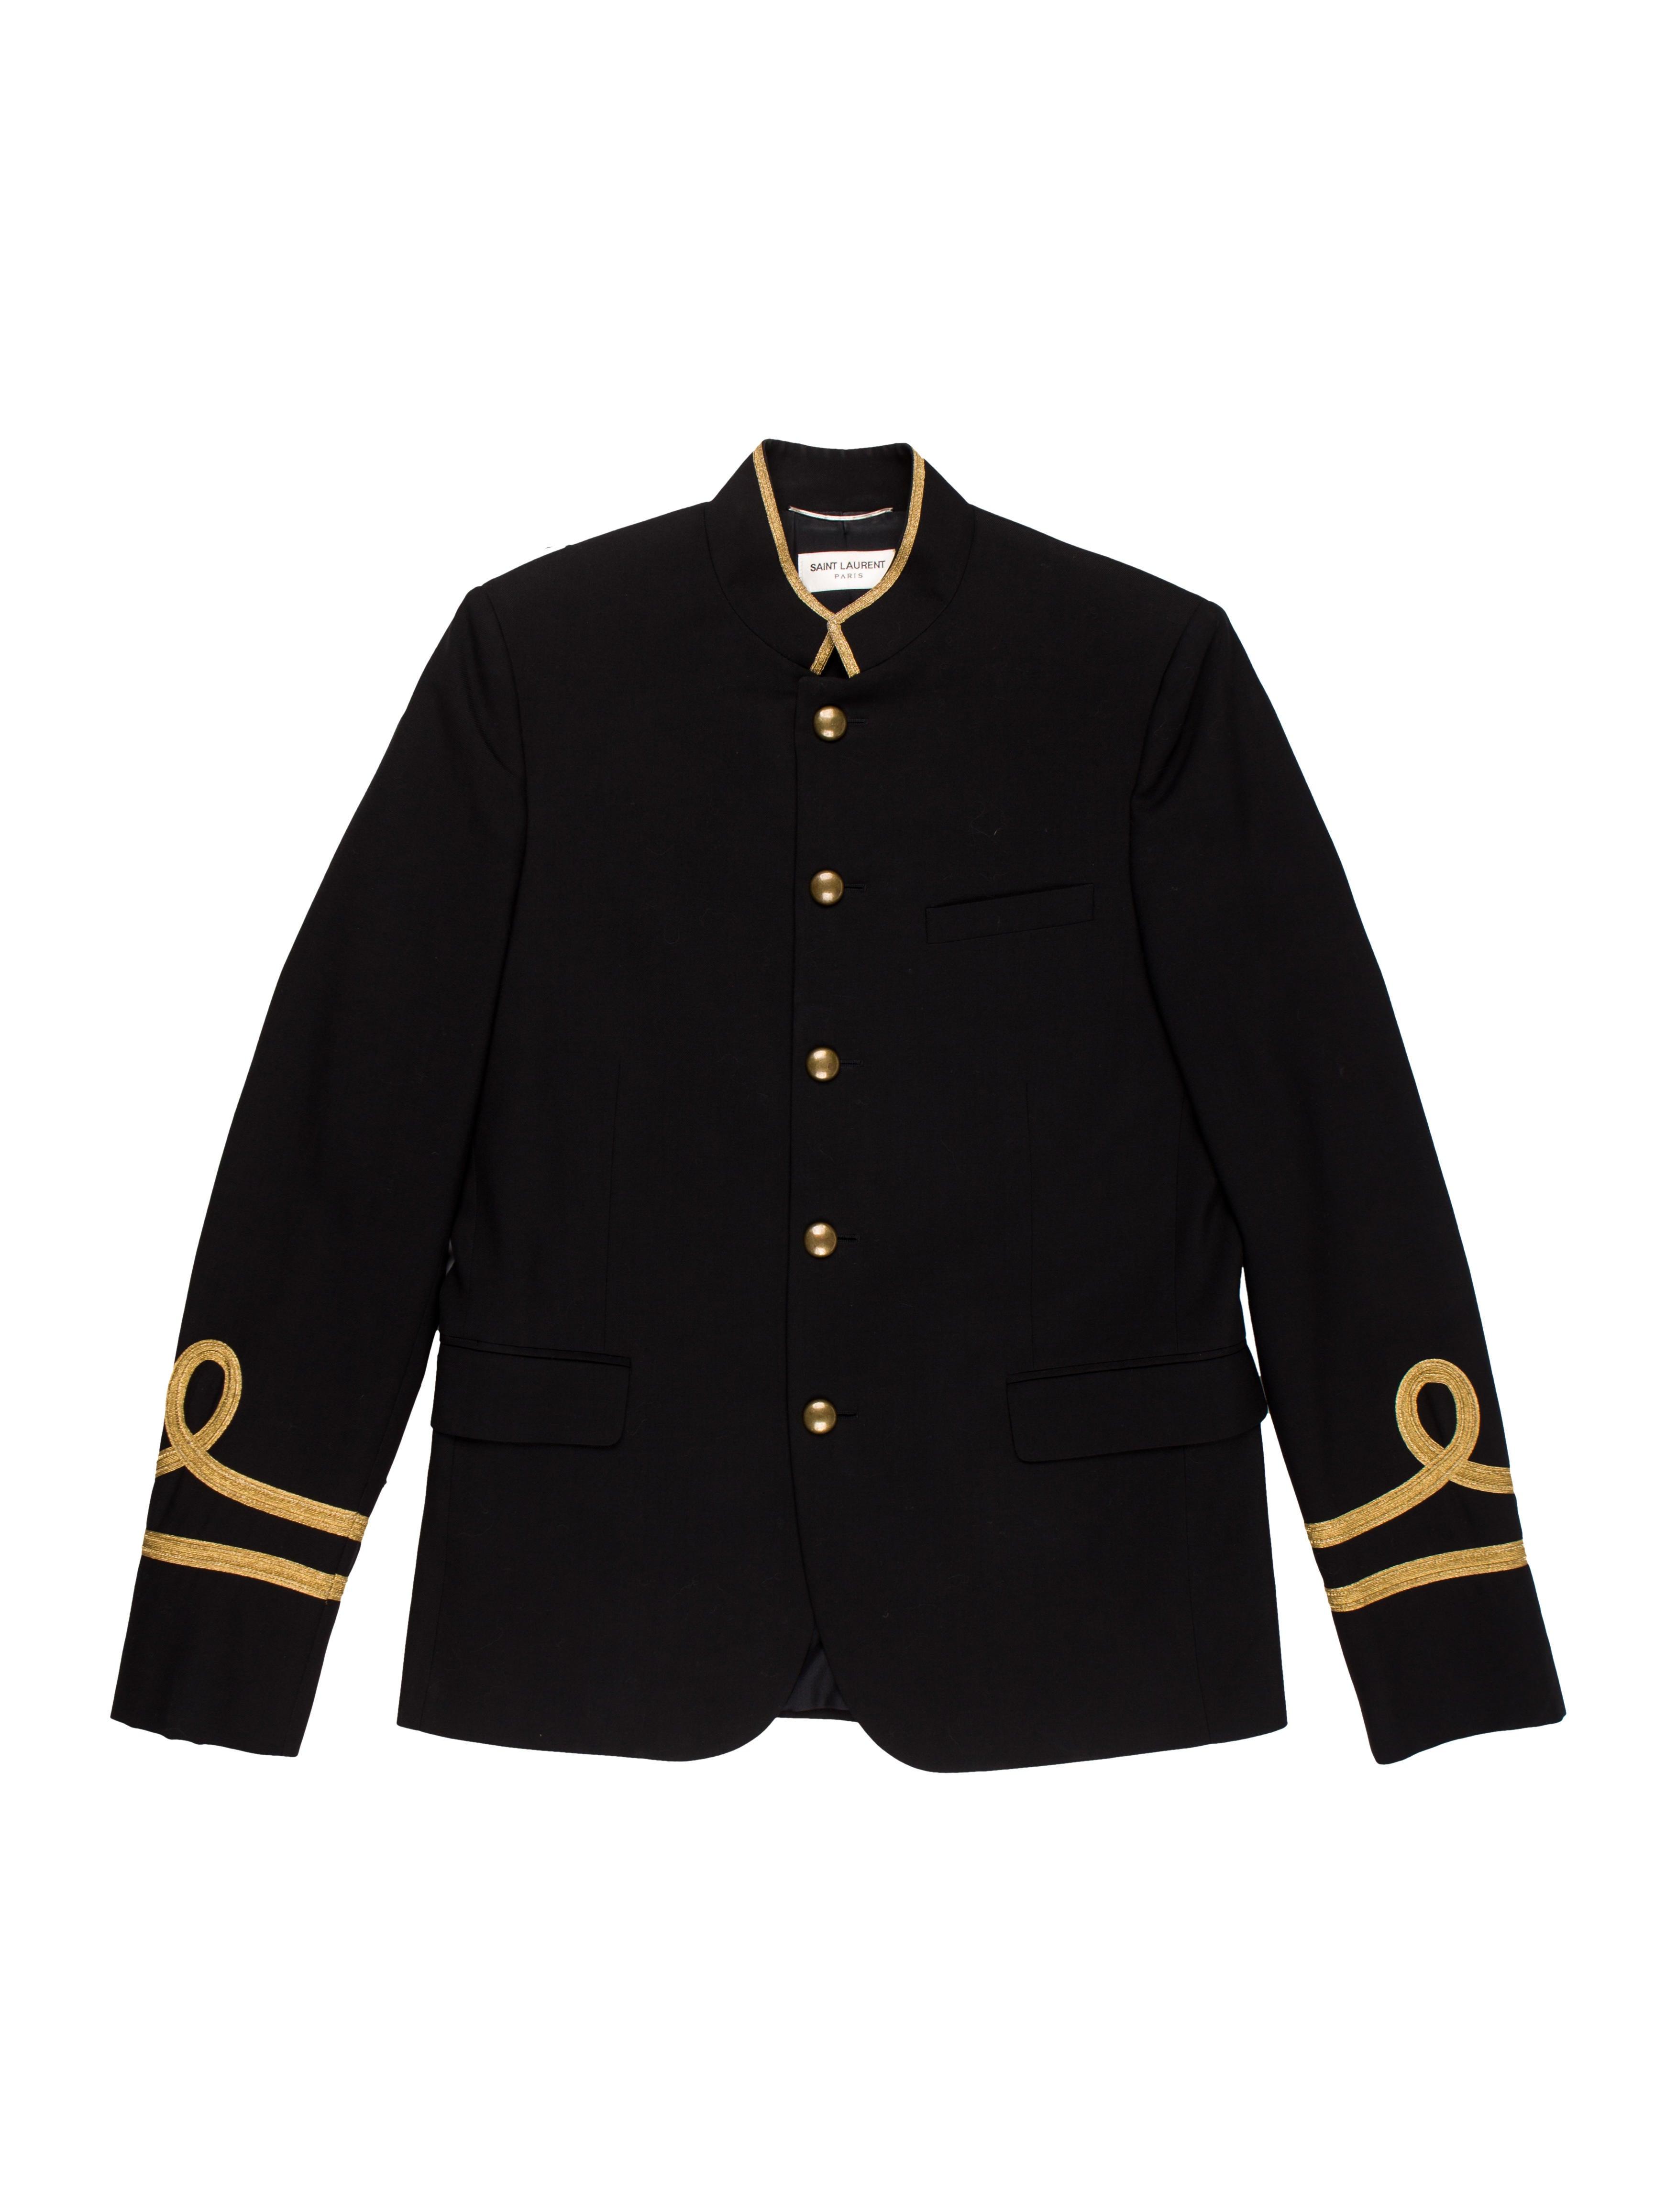 504f49d3729 Saint Laurent 2015 Metallic Virgin Wool Officer Jacket - Clothing ...